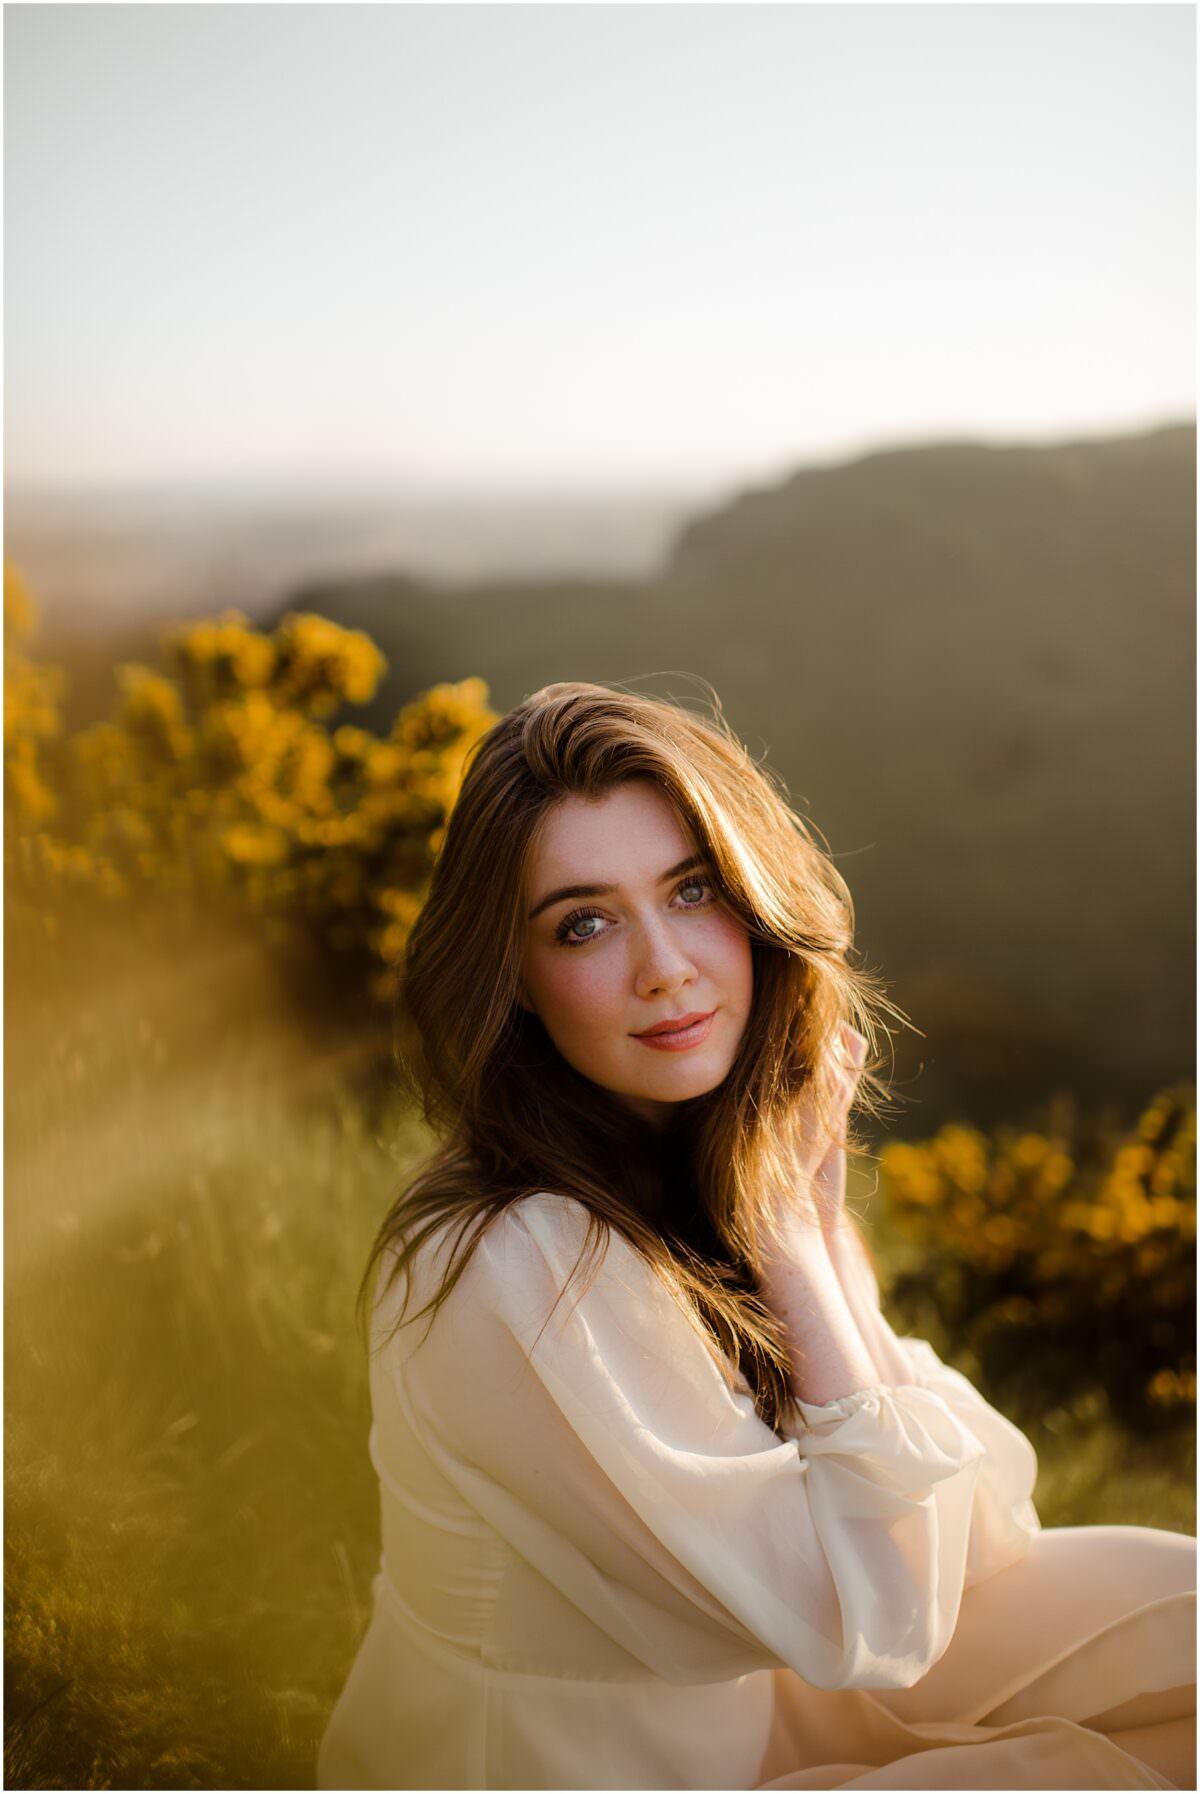 Scotland portrait photographer - Arthur's Seat sunset portrait photoshoot in Edinburgh